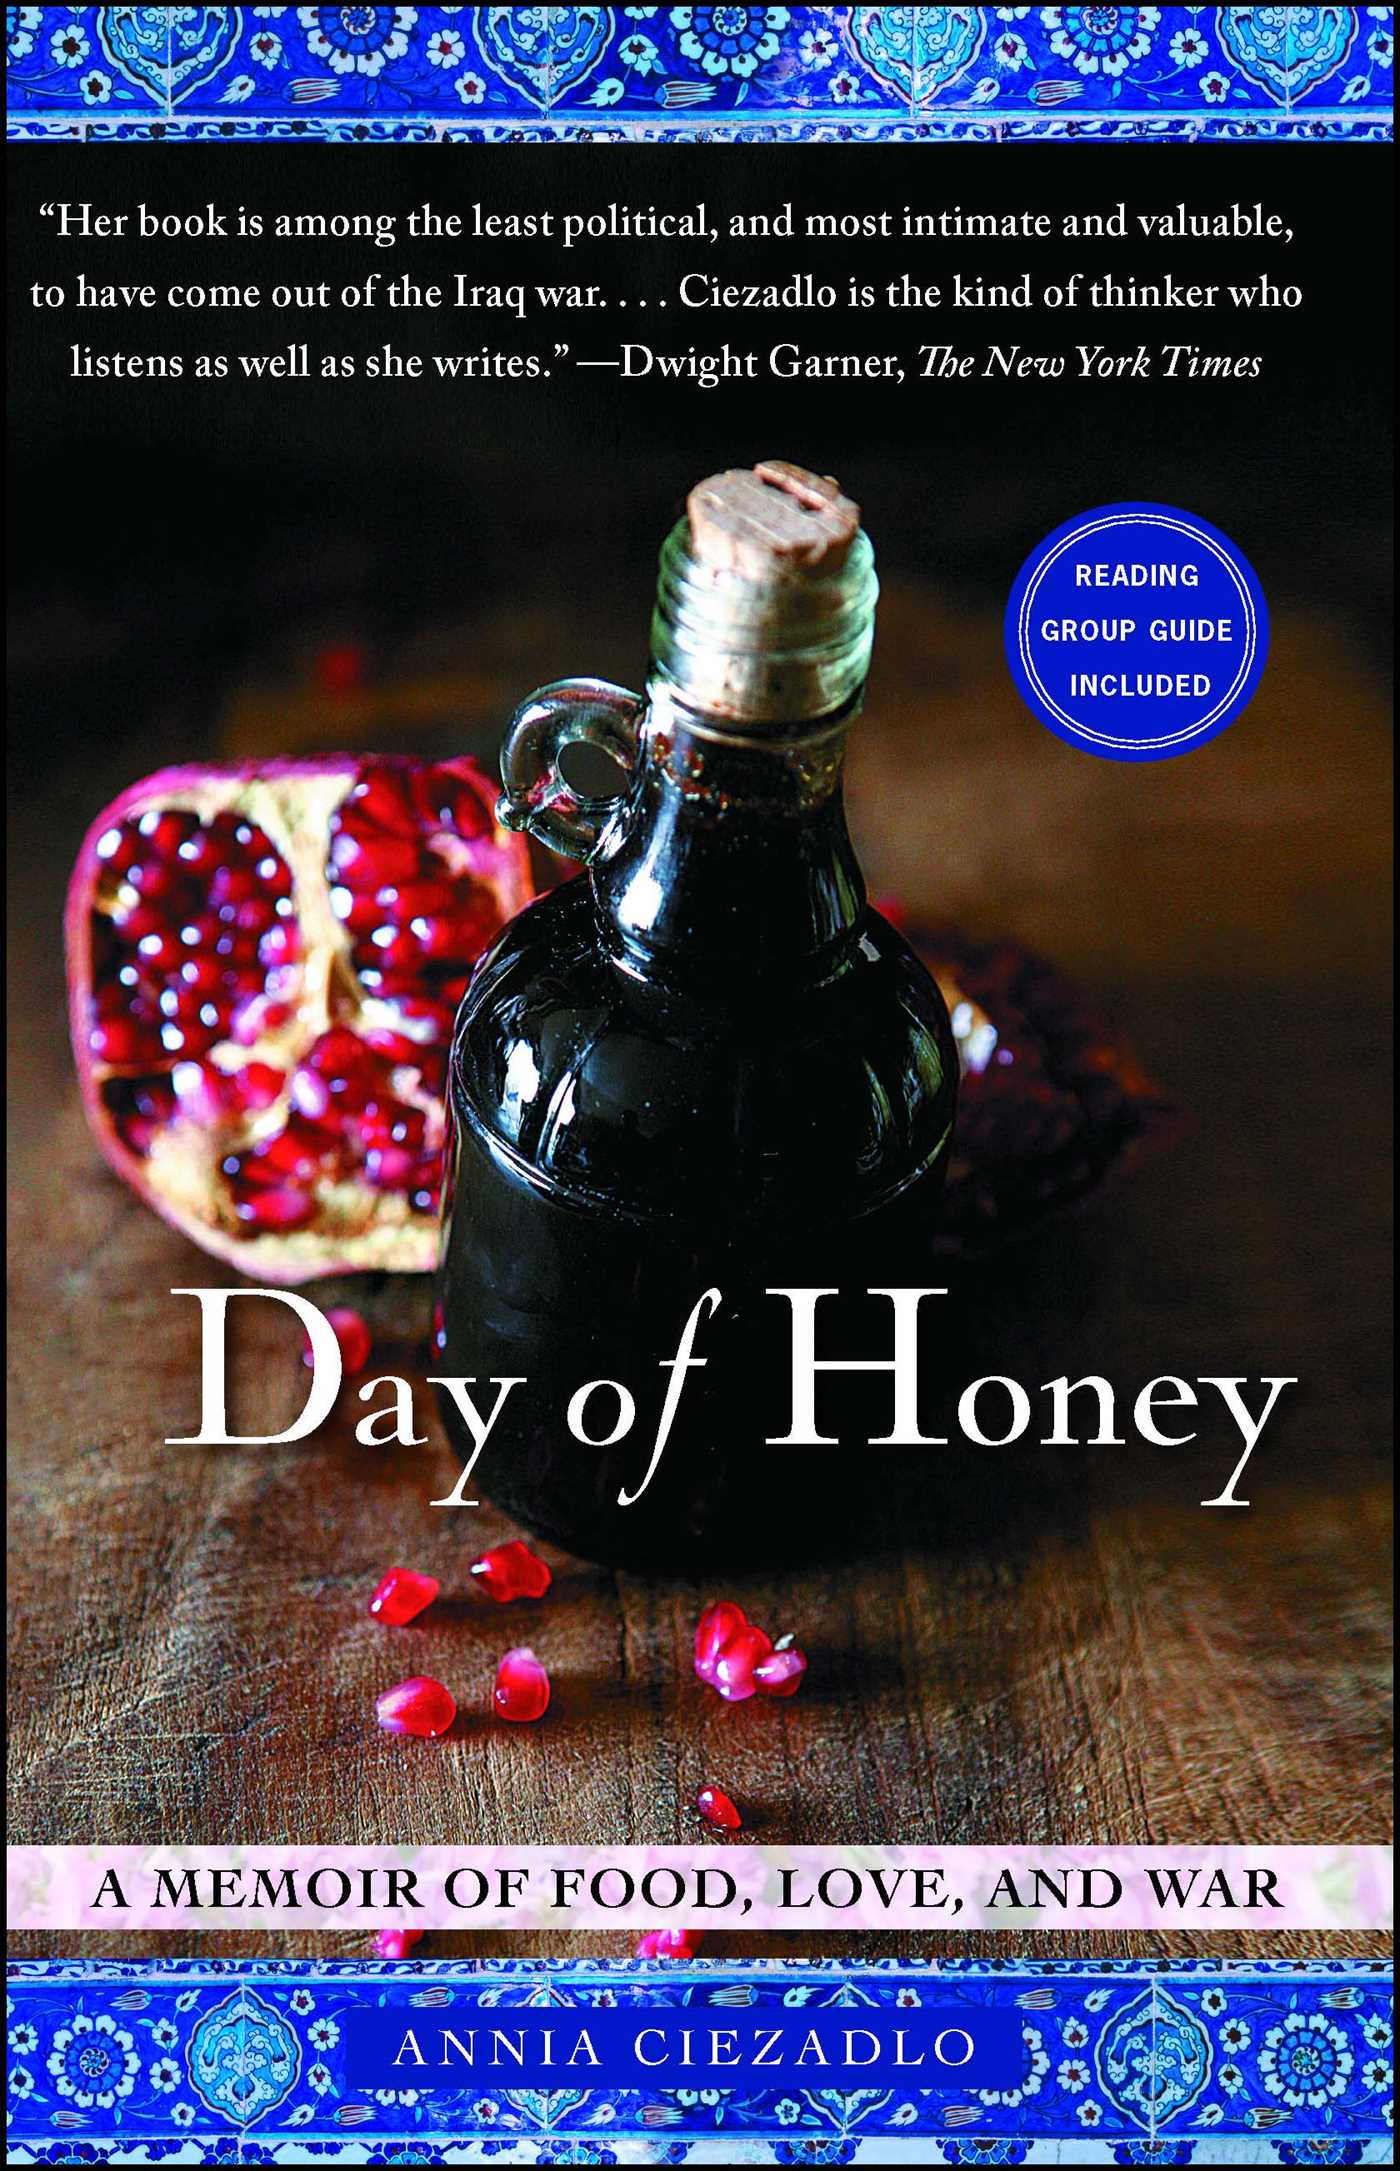 Day of honey 9781416583943 hr